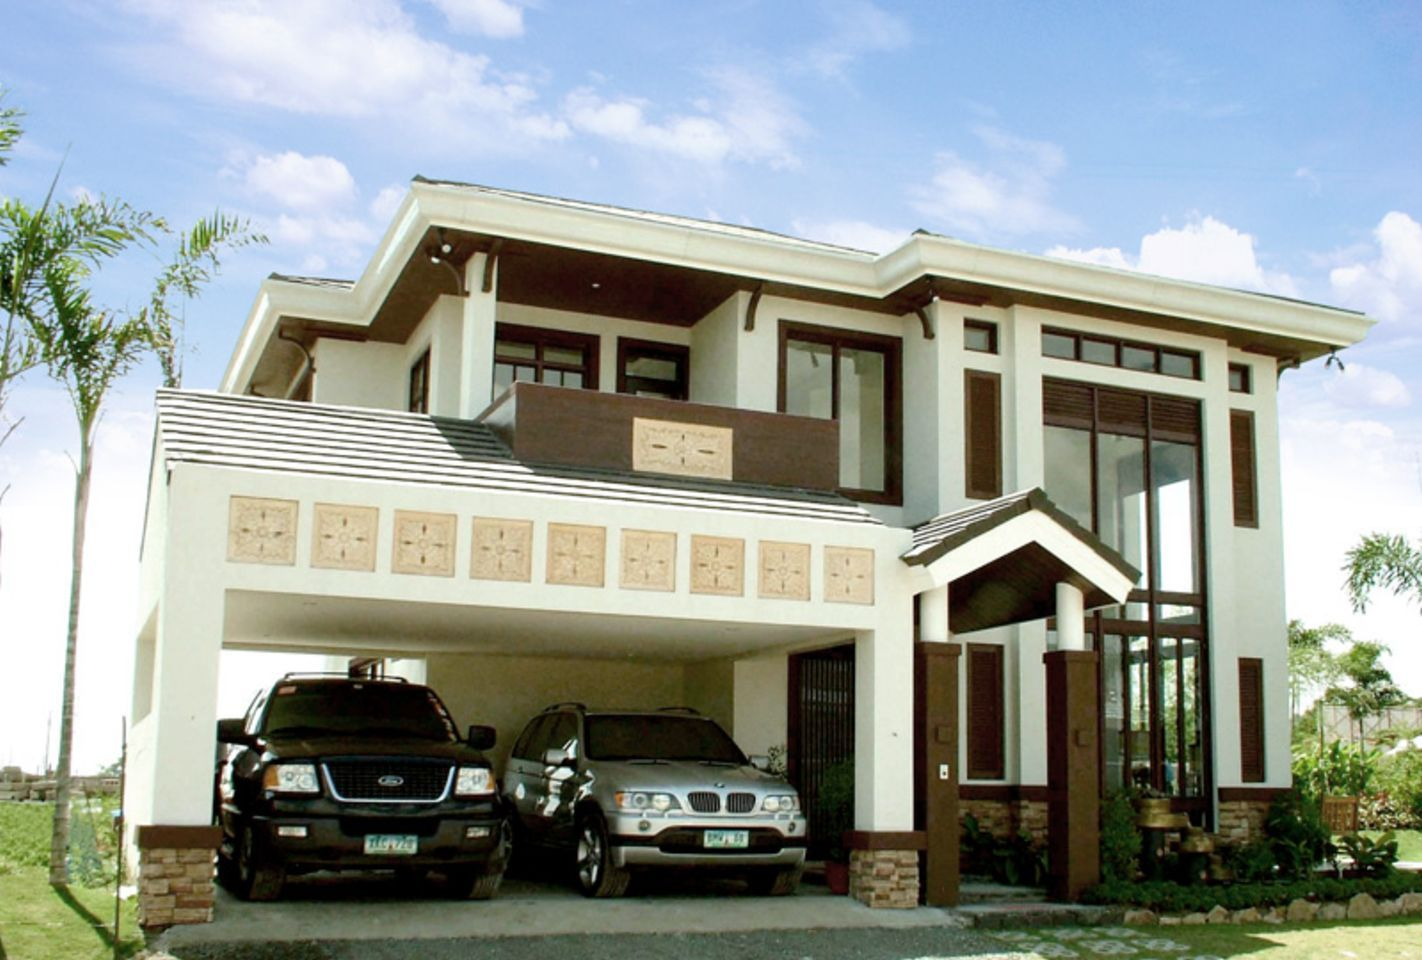 Modelo de casa de dos pisos con garaje grande for Modelos de garajes